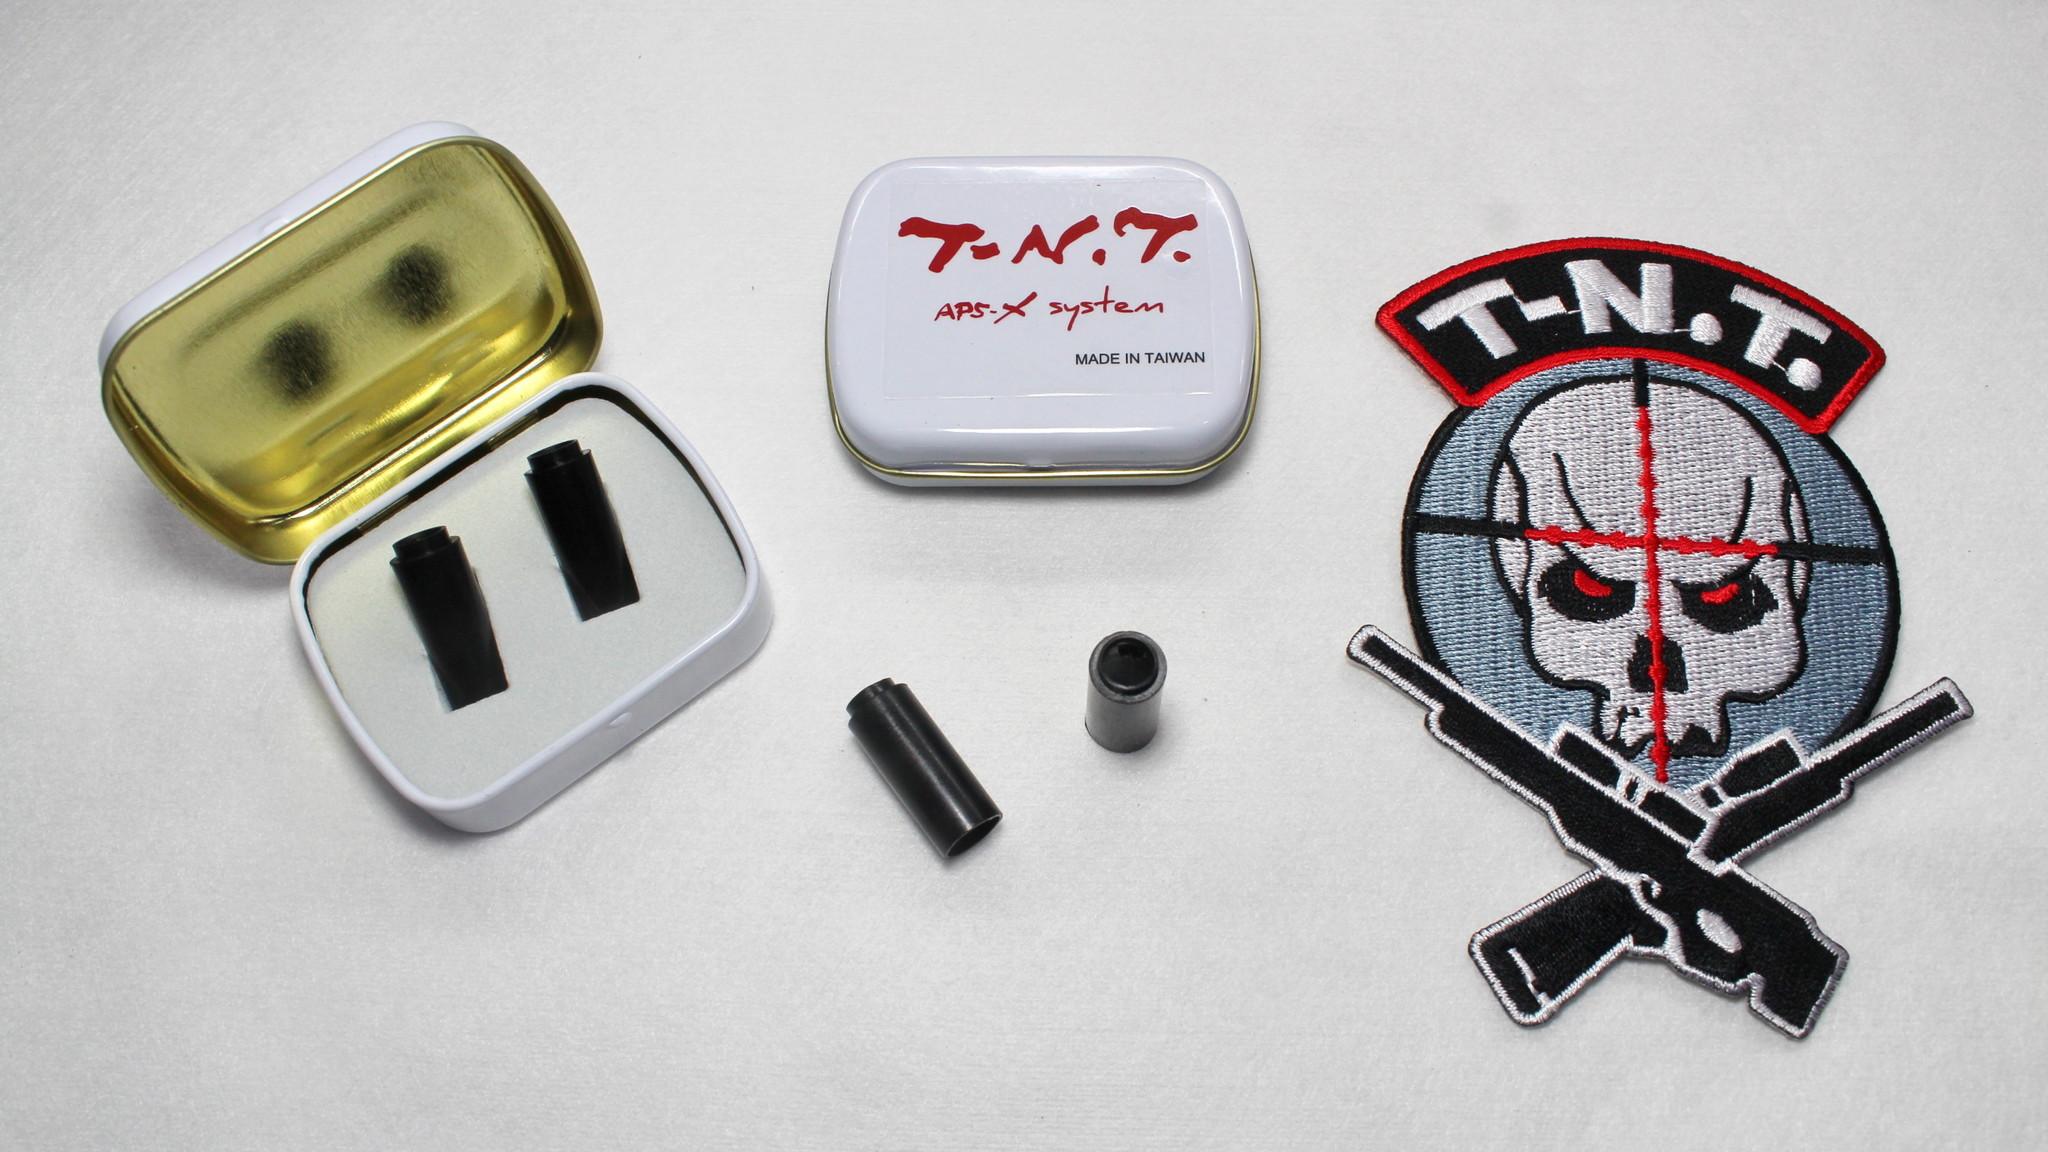 TNT Studio TR-Hop Terminator Hopup Bucking 2 pack 60°